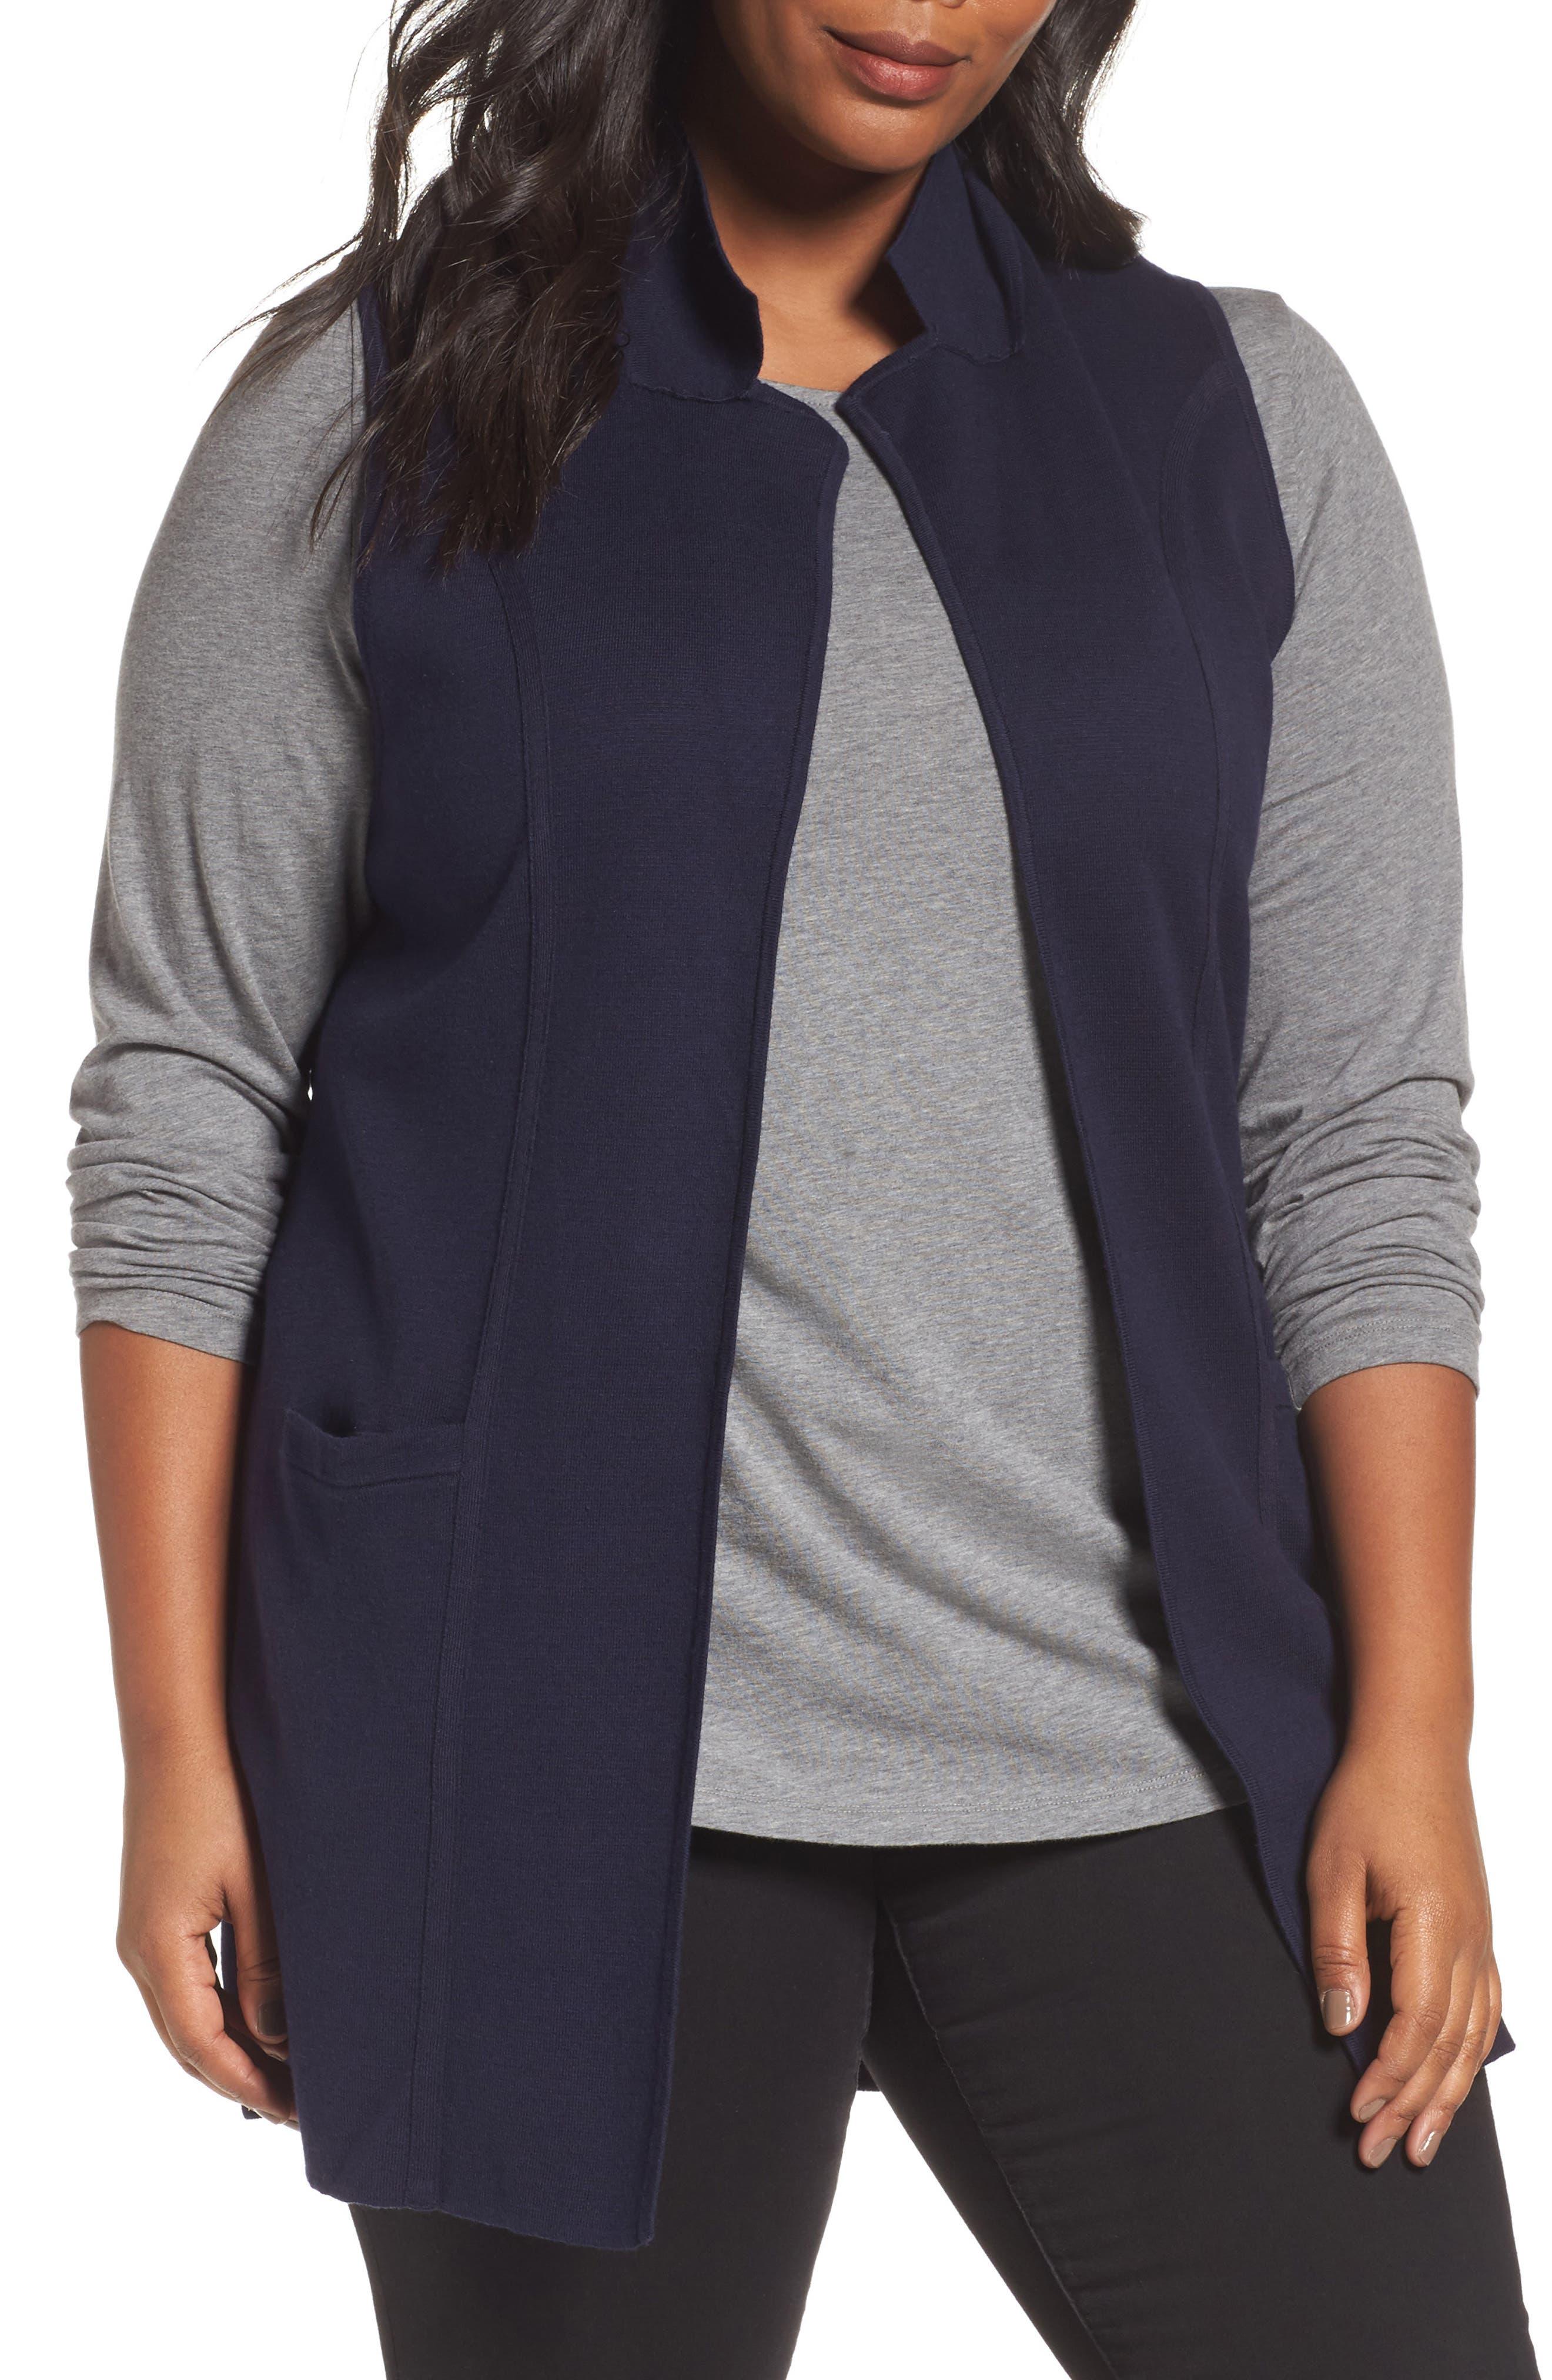 Alternate Image 1 Selected - Foxcroft Jodi Longline Sweater Vest (Plus Size)